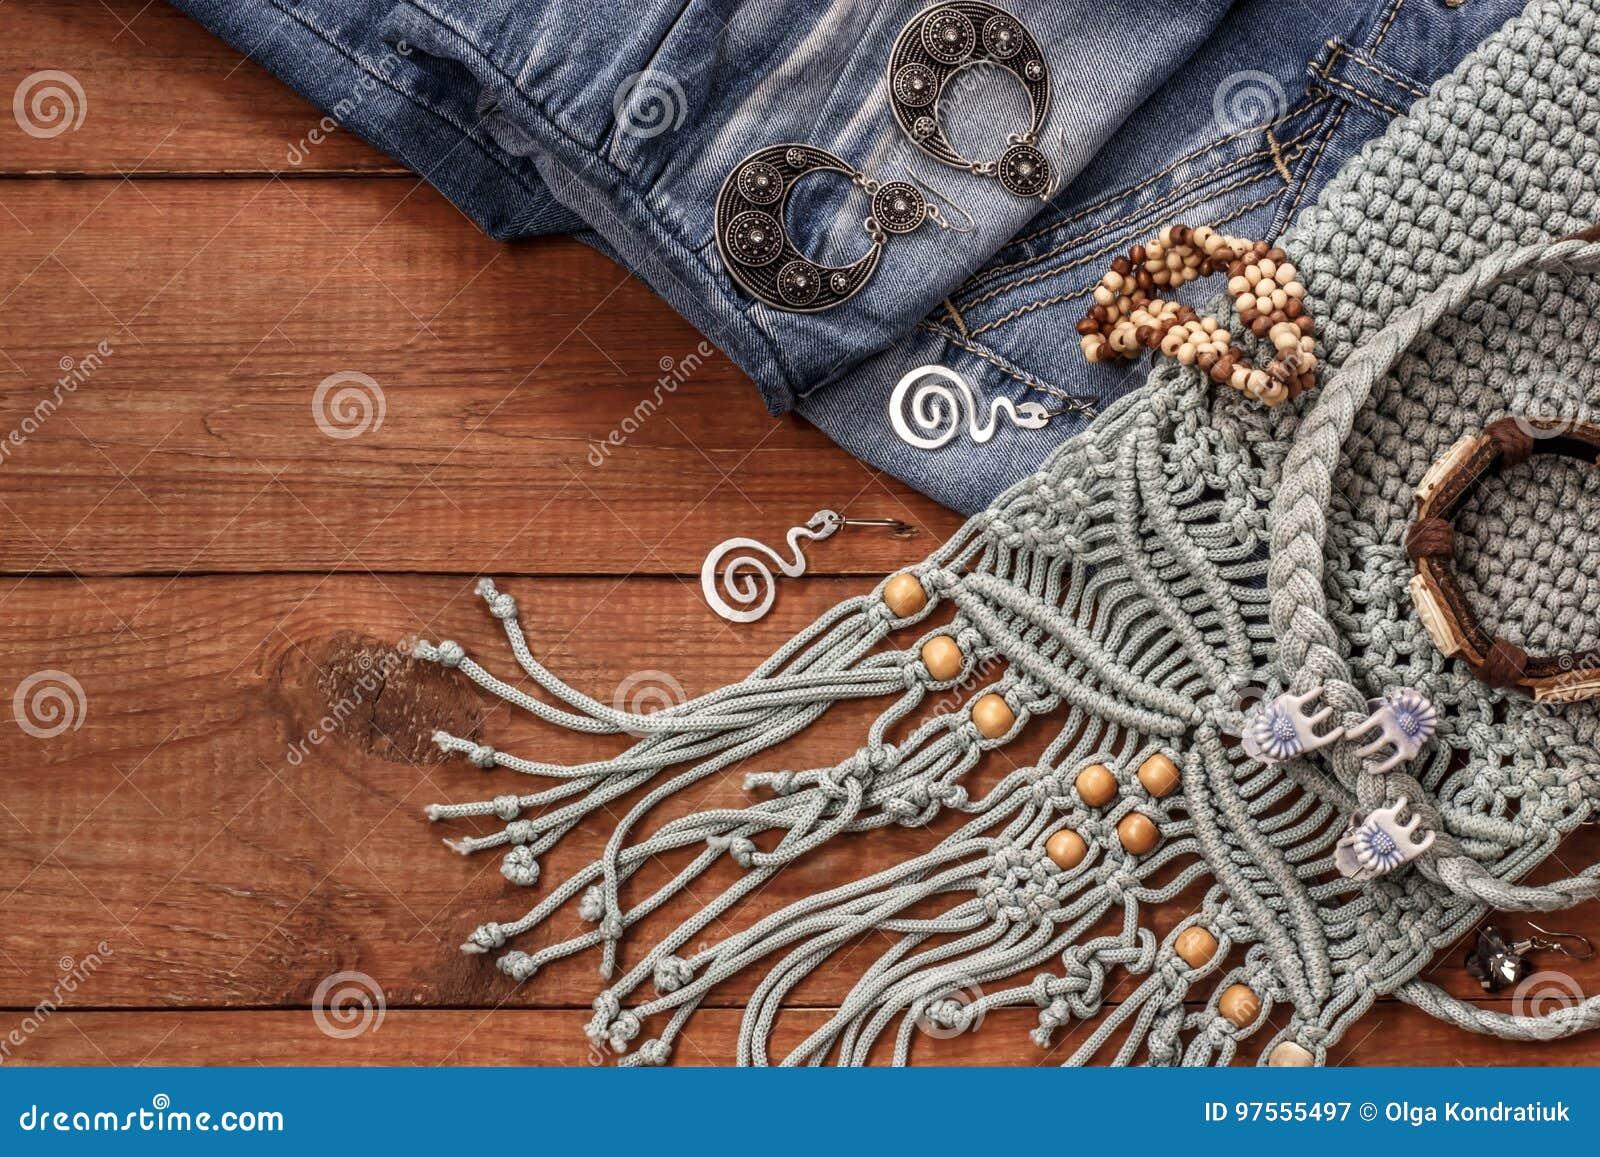 Boho stil- och hippietyger, armband, halsband, jeans